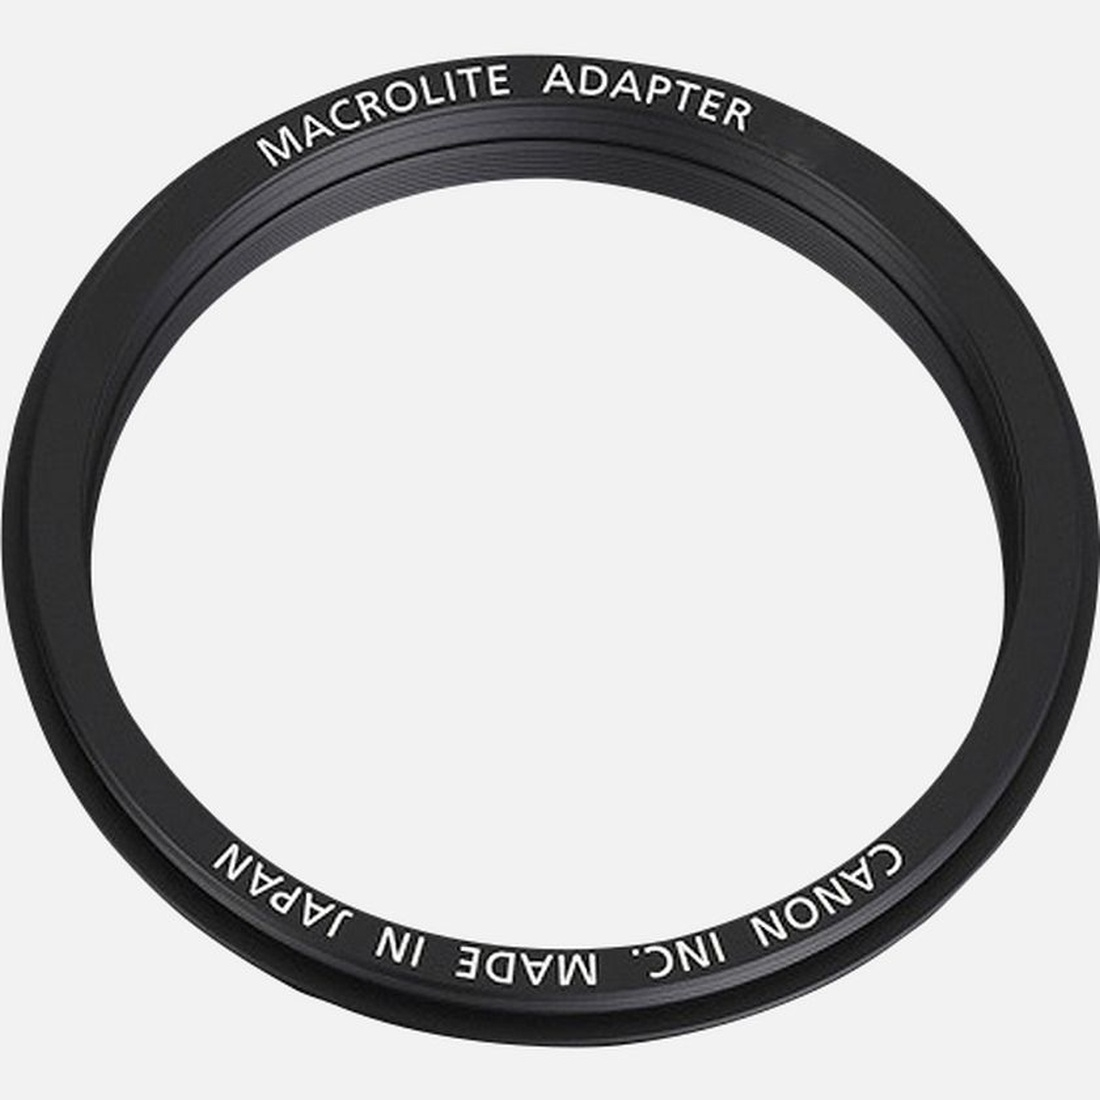 CANON Macrolite Adapter 72C